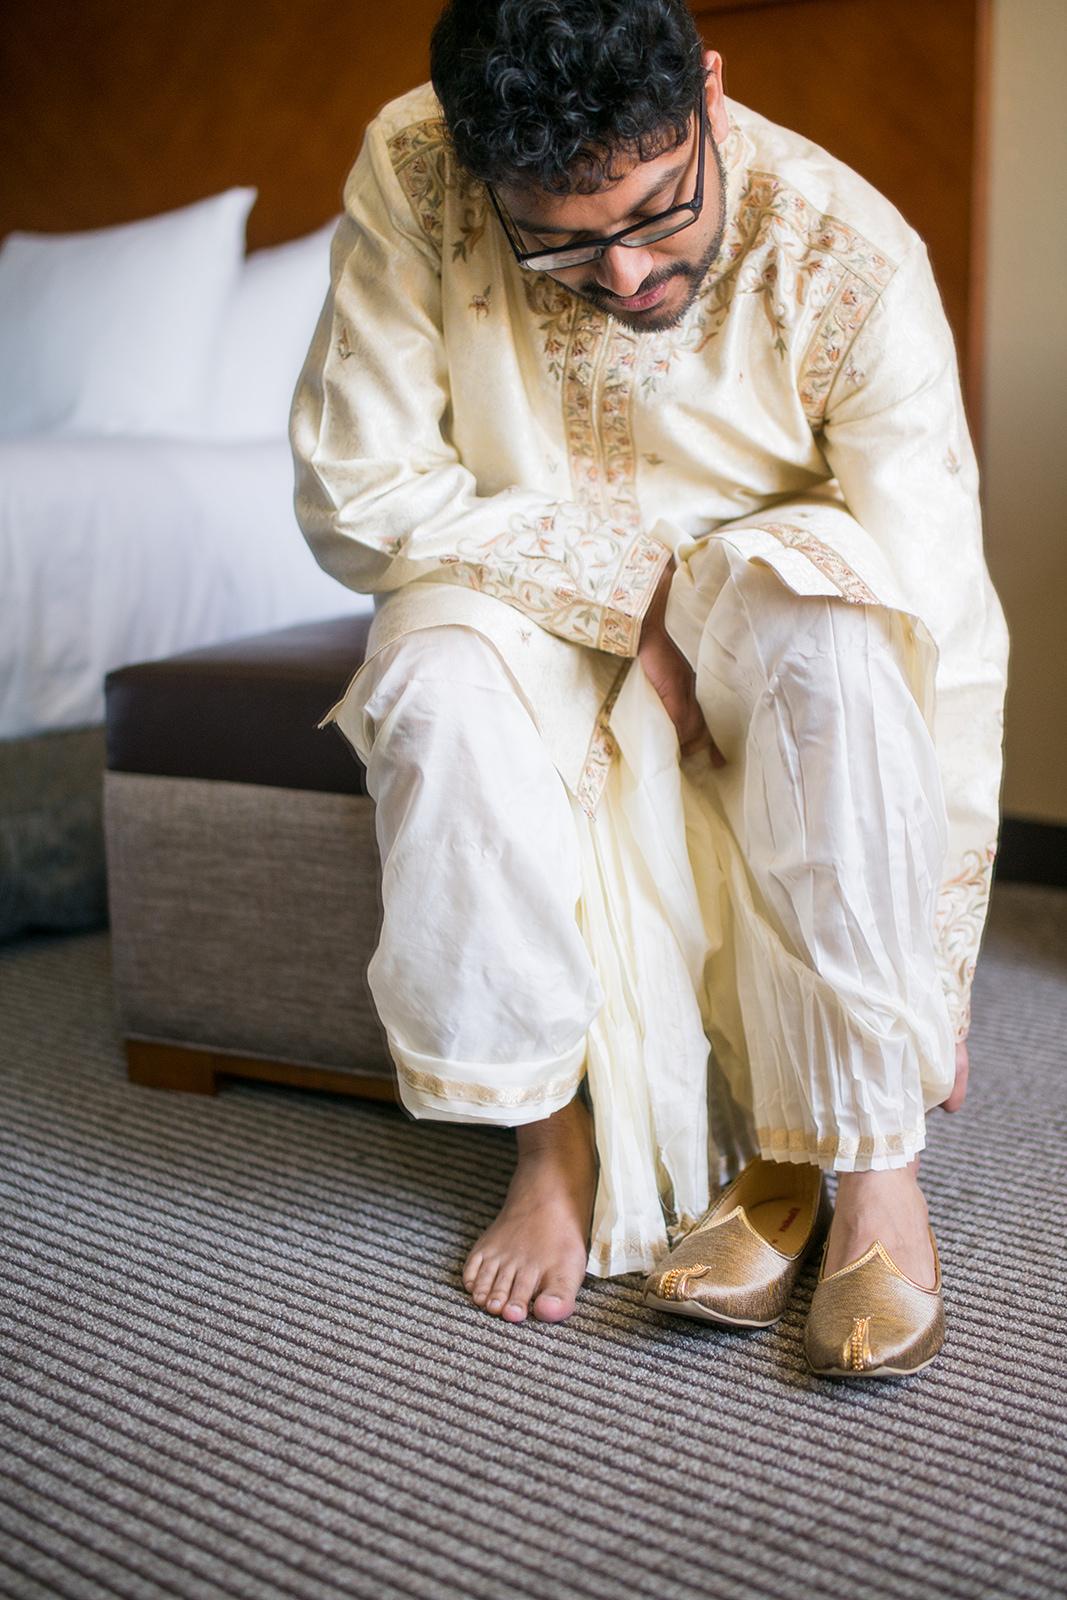 Le Cape Weddings - South Asian Wedding - Ishani and Sidhart - Groom-9.jpg